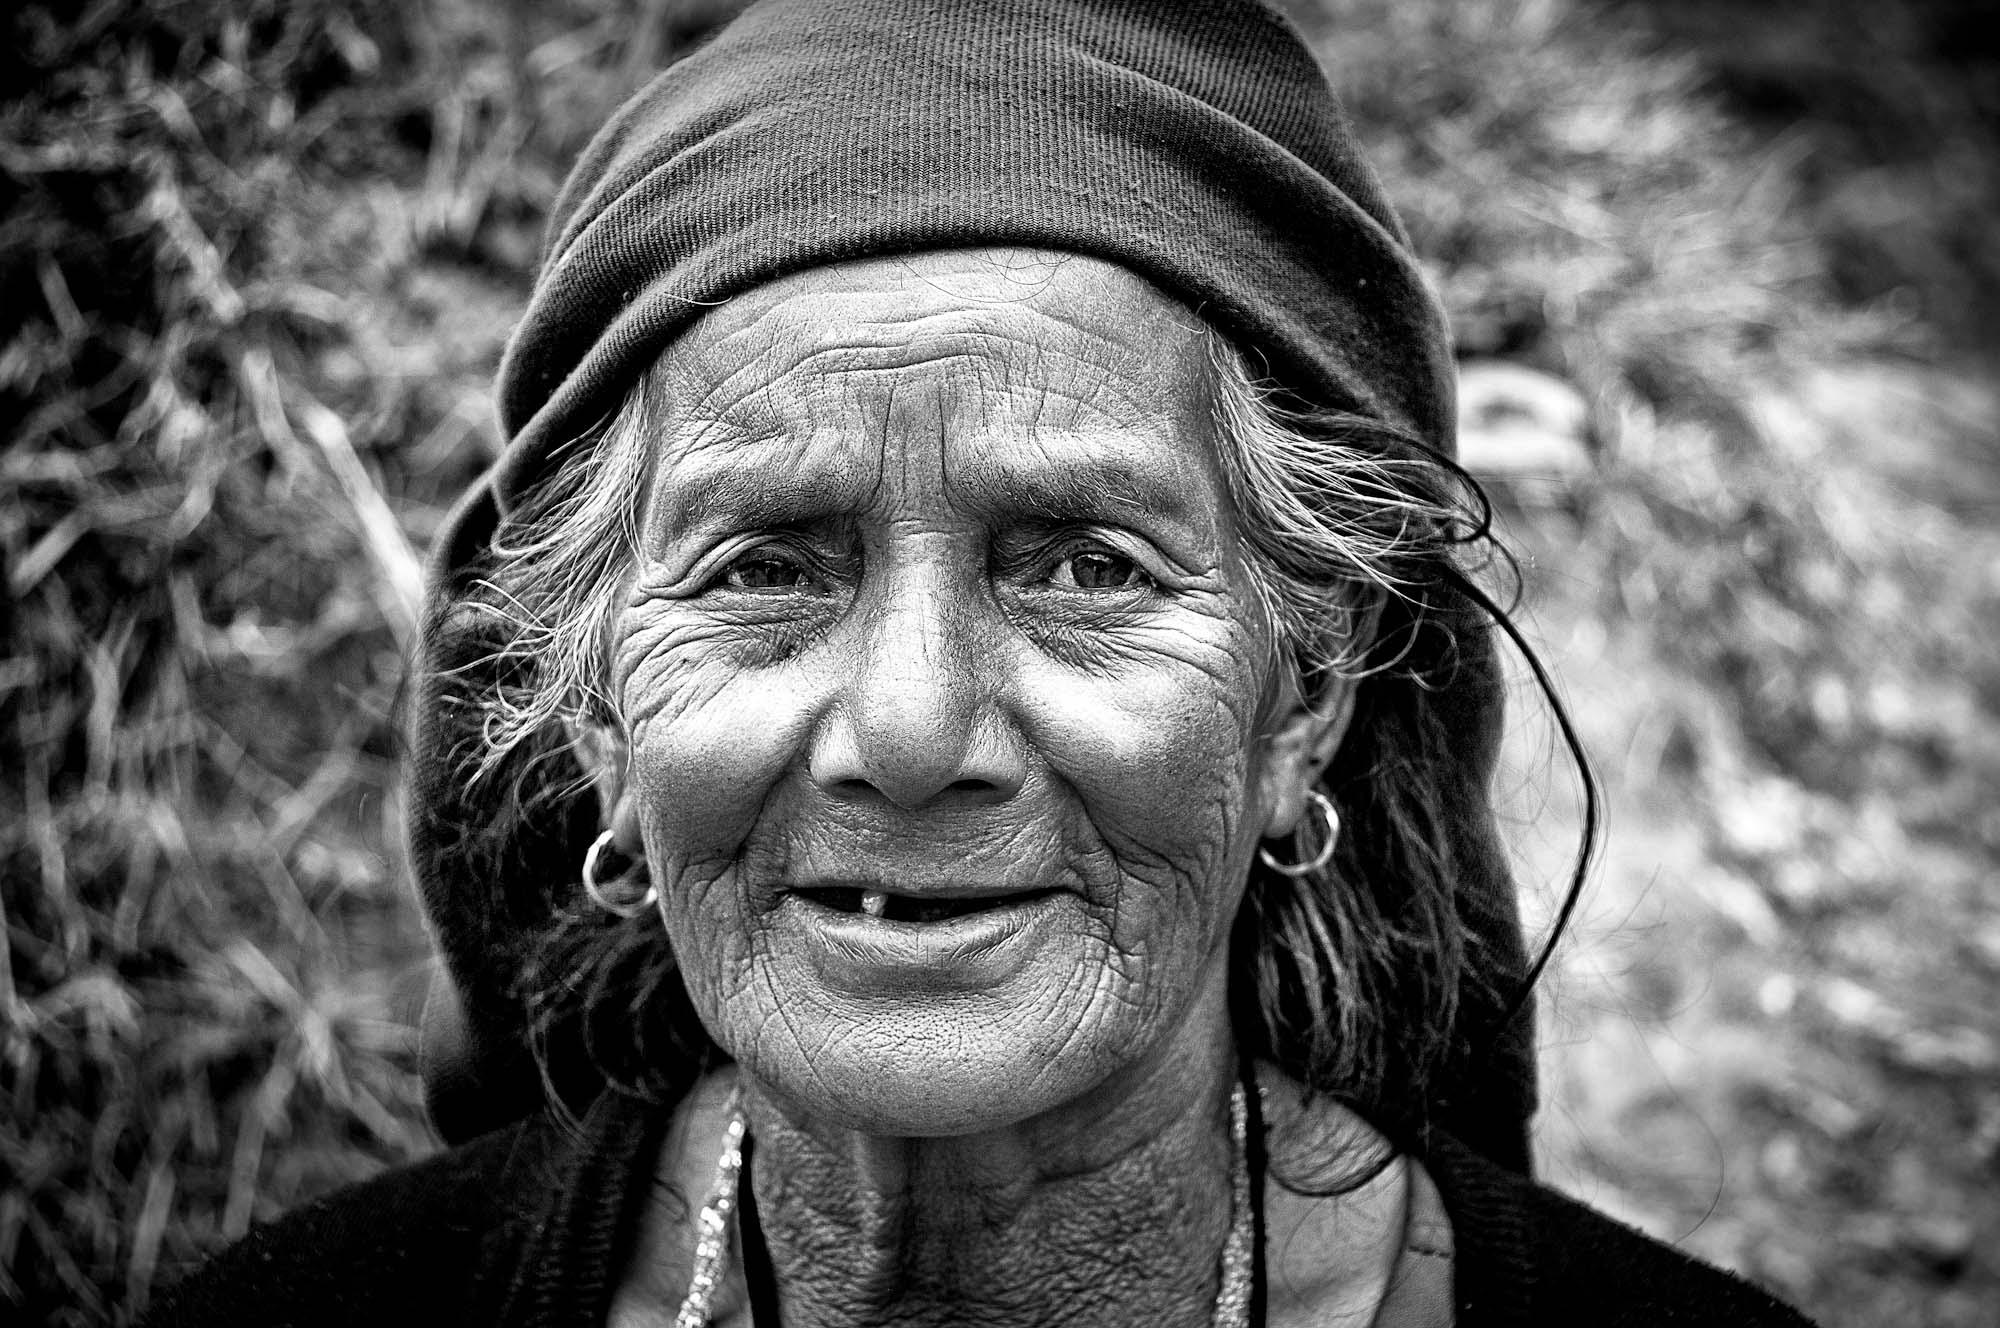 old woman images - usseek.com